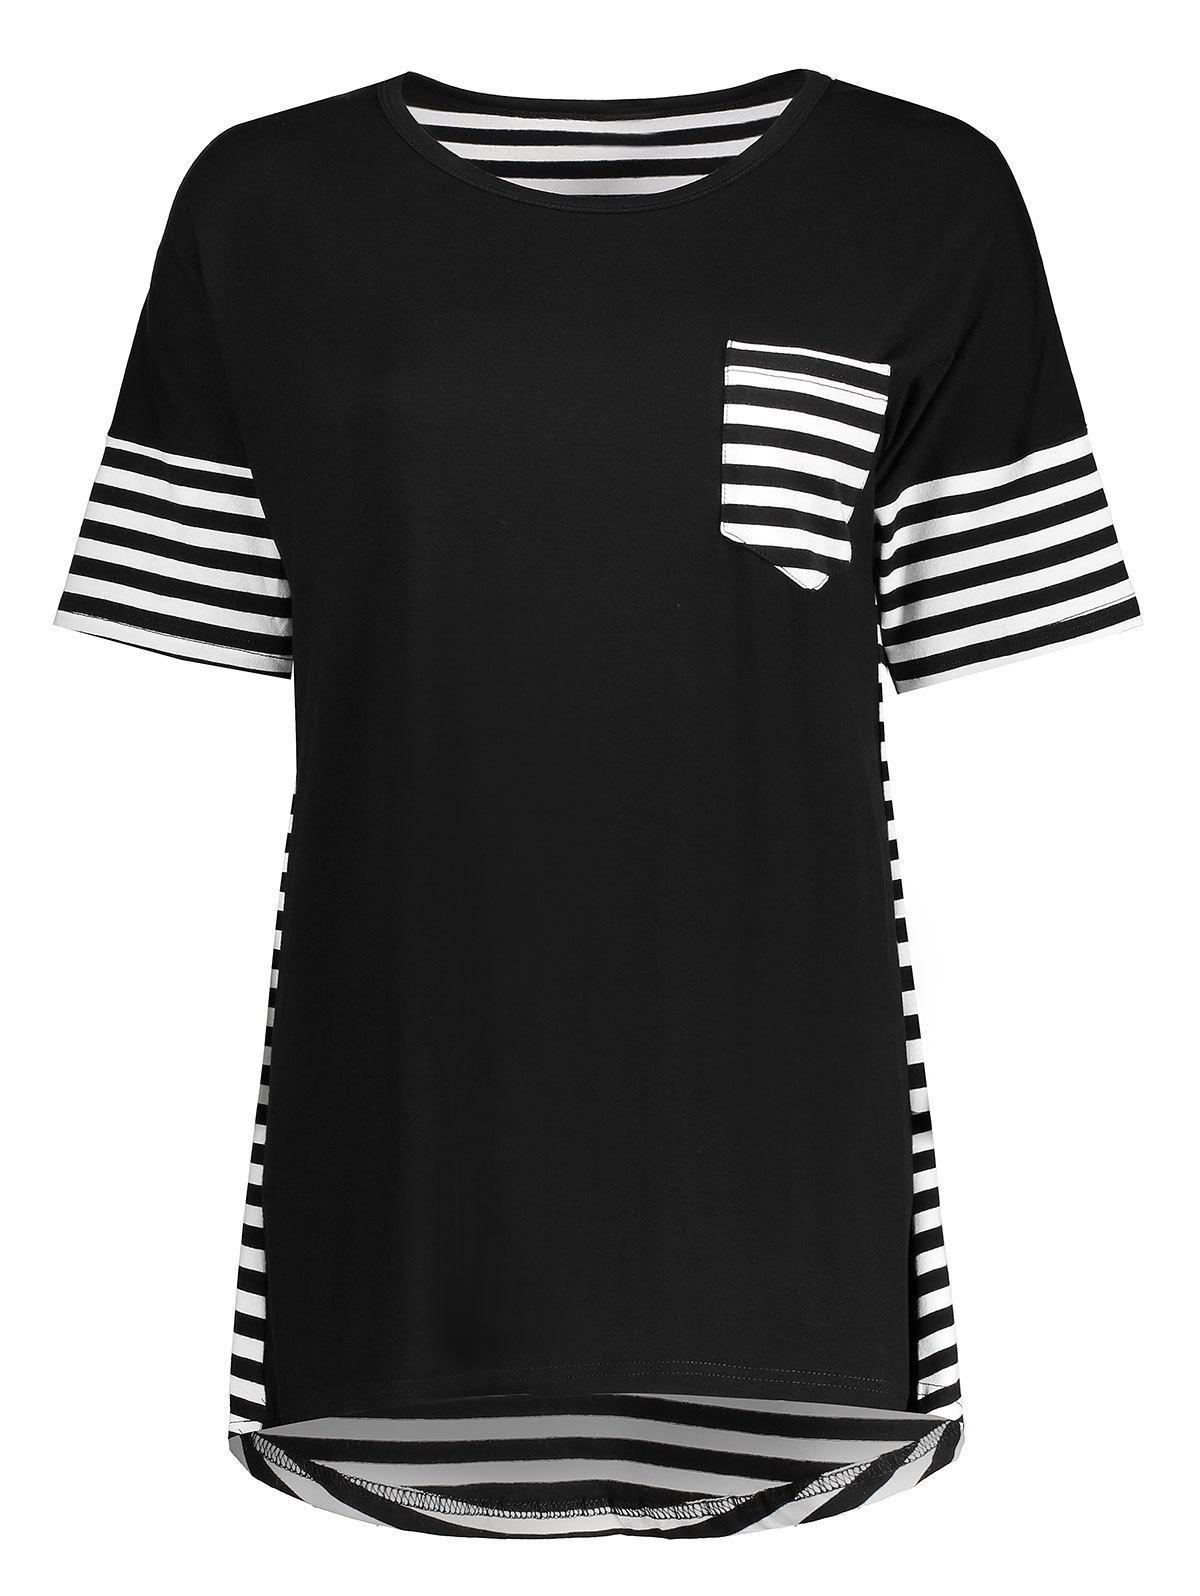 Striped Pocket High Low Tunic Tee 213517904